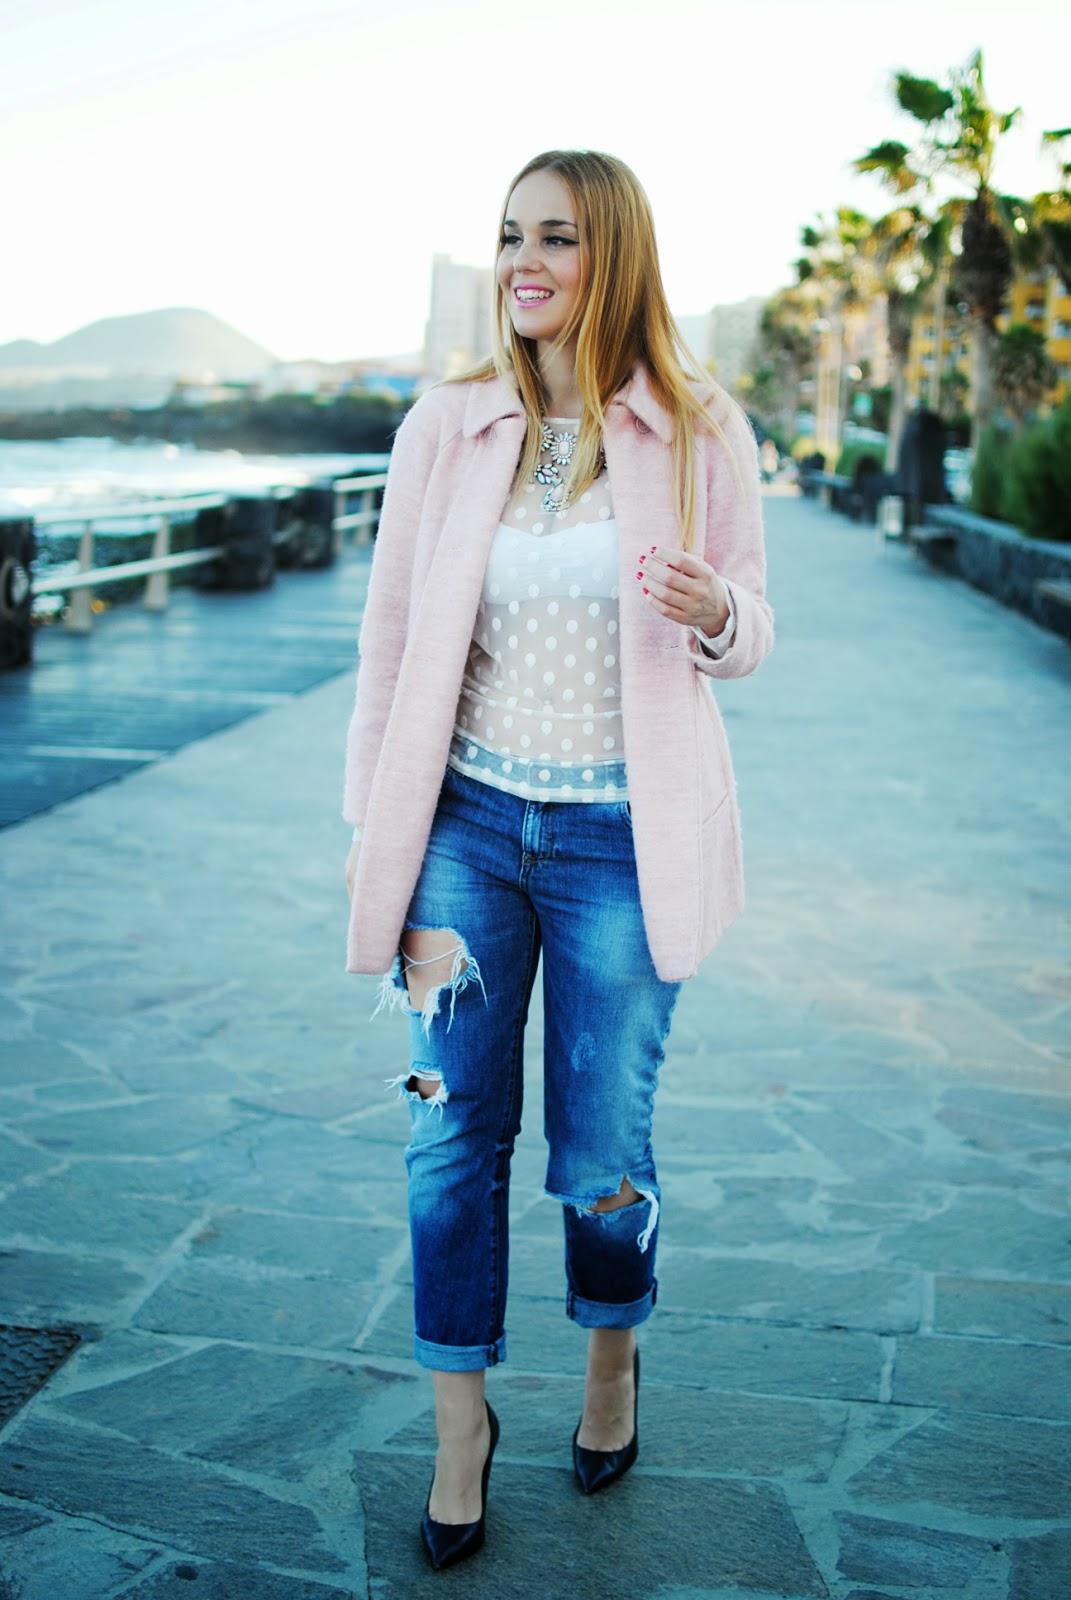 nery hdez, candy coat, polka dots, blonde , boyfriend jeans